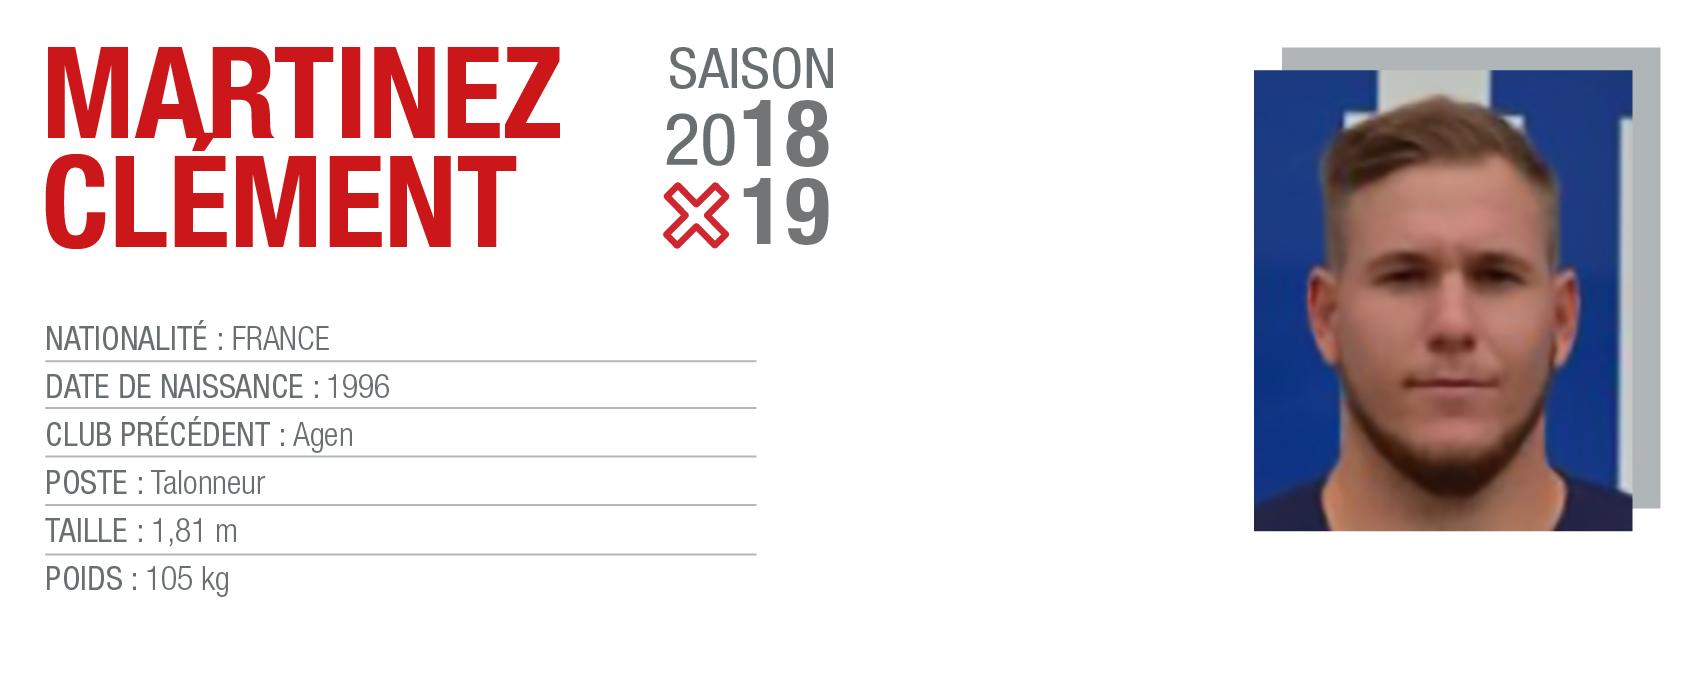 SAISON 2018 - 2019 - Page 2 5b2392e0bbddbd3fcb0dfce8